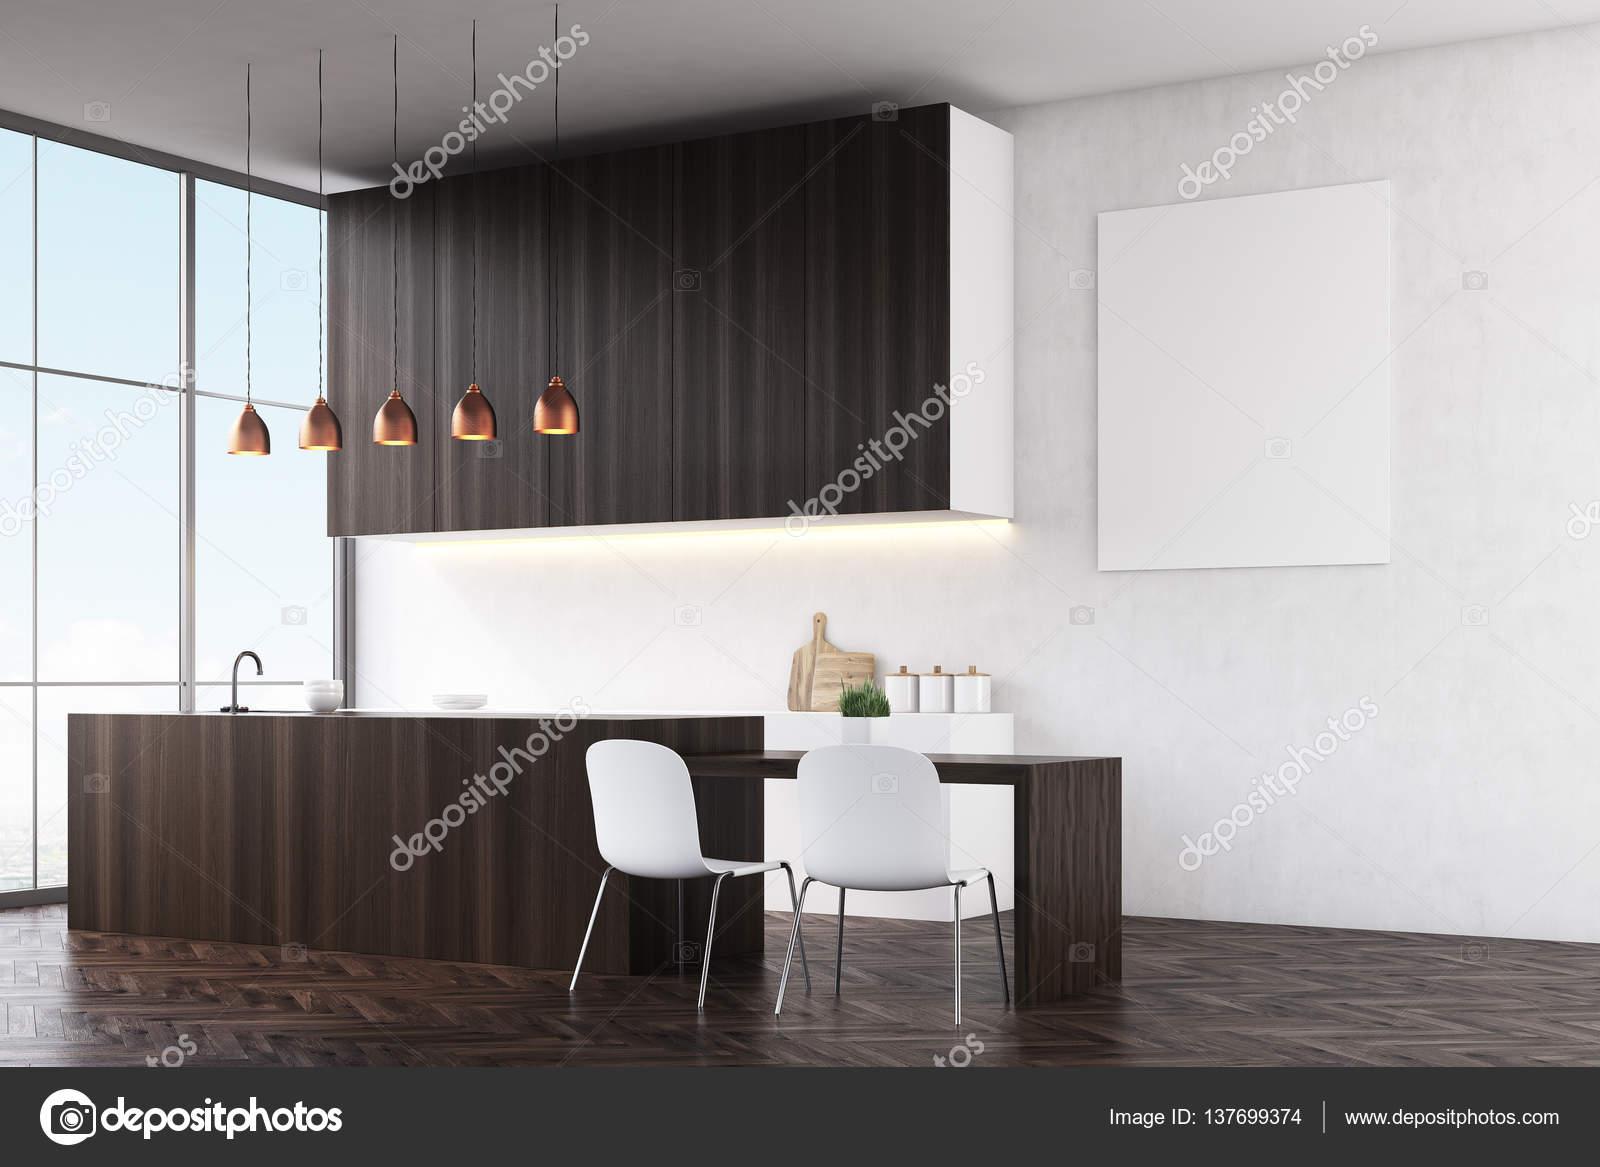 Cocina con paredes blancas, contadores de madera oscuros y sillas ...